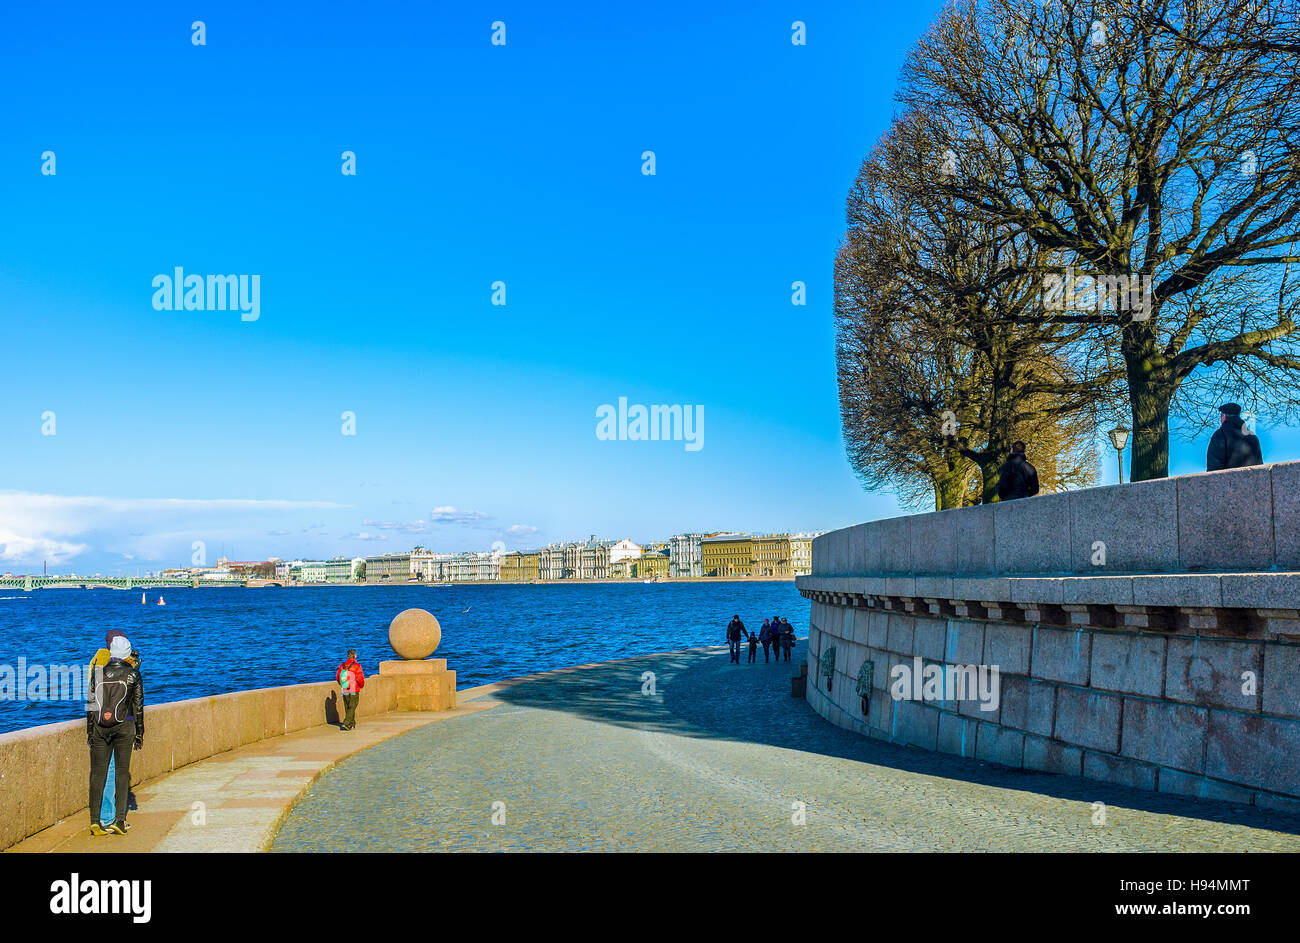 Overview of swimming pools on Vasilyevsky Island in St. Petersburg 46